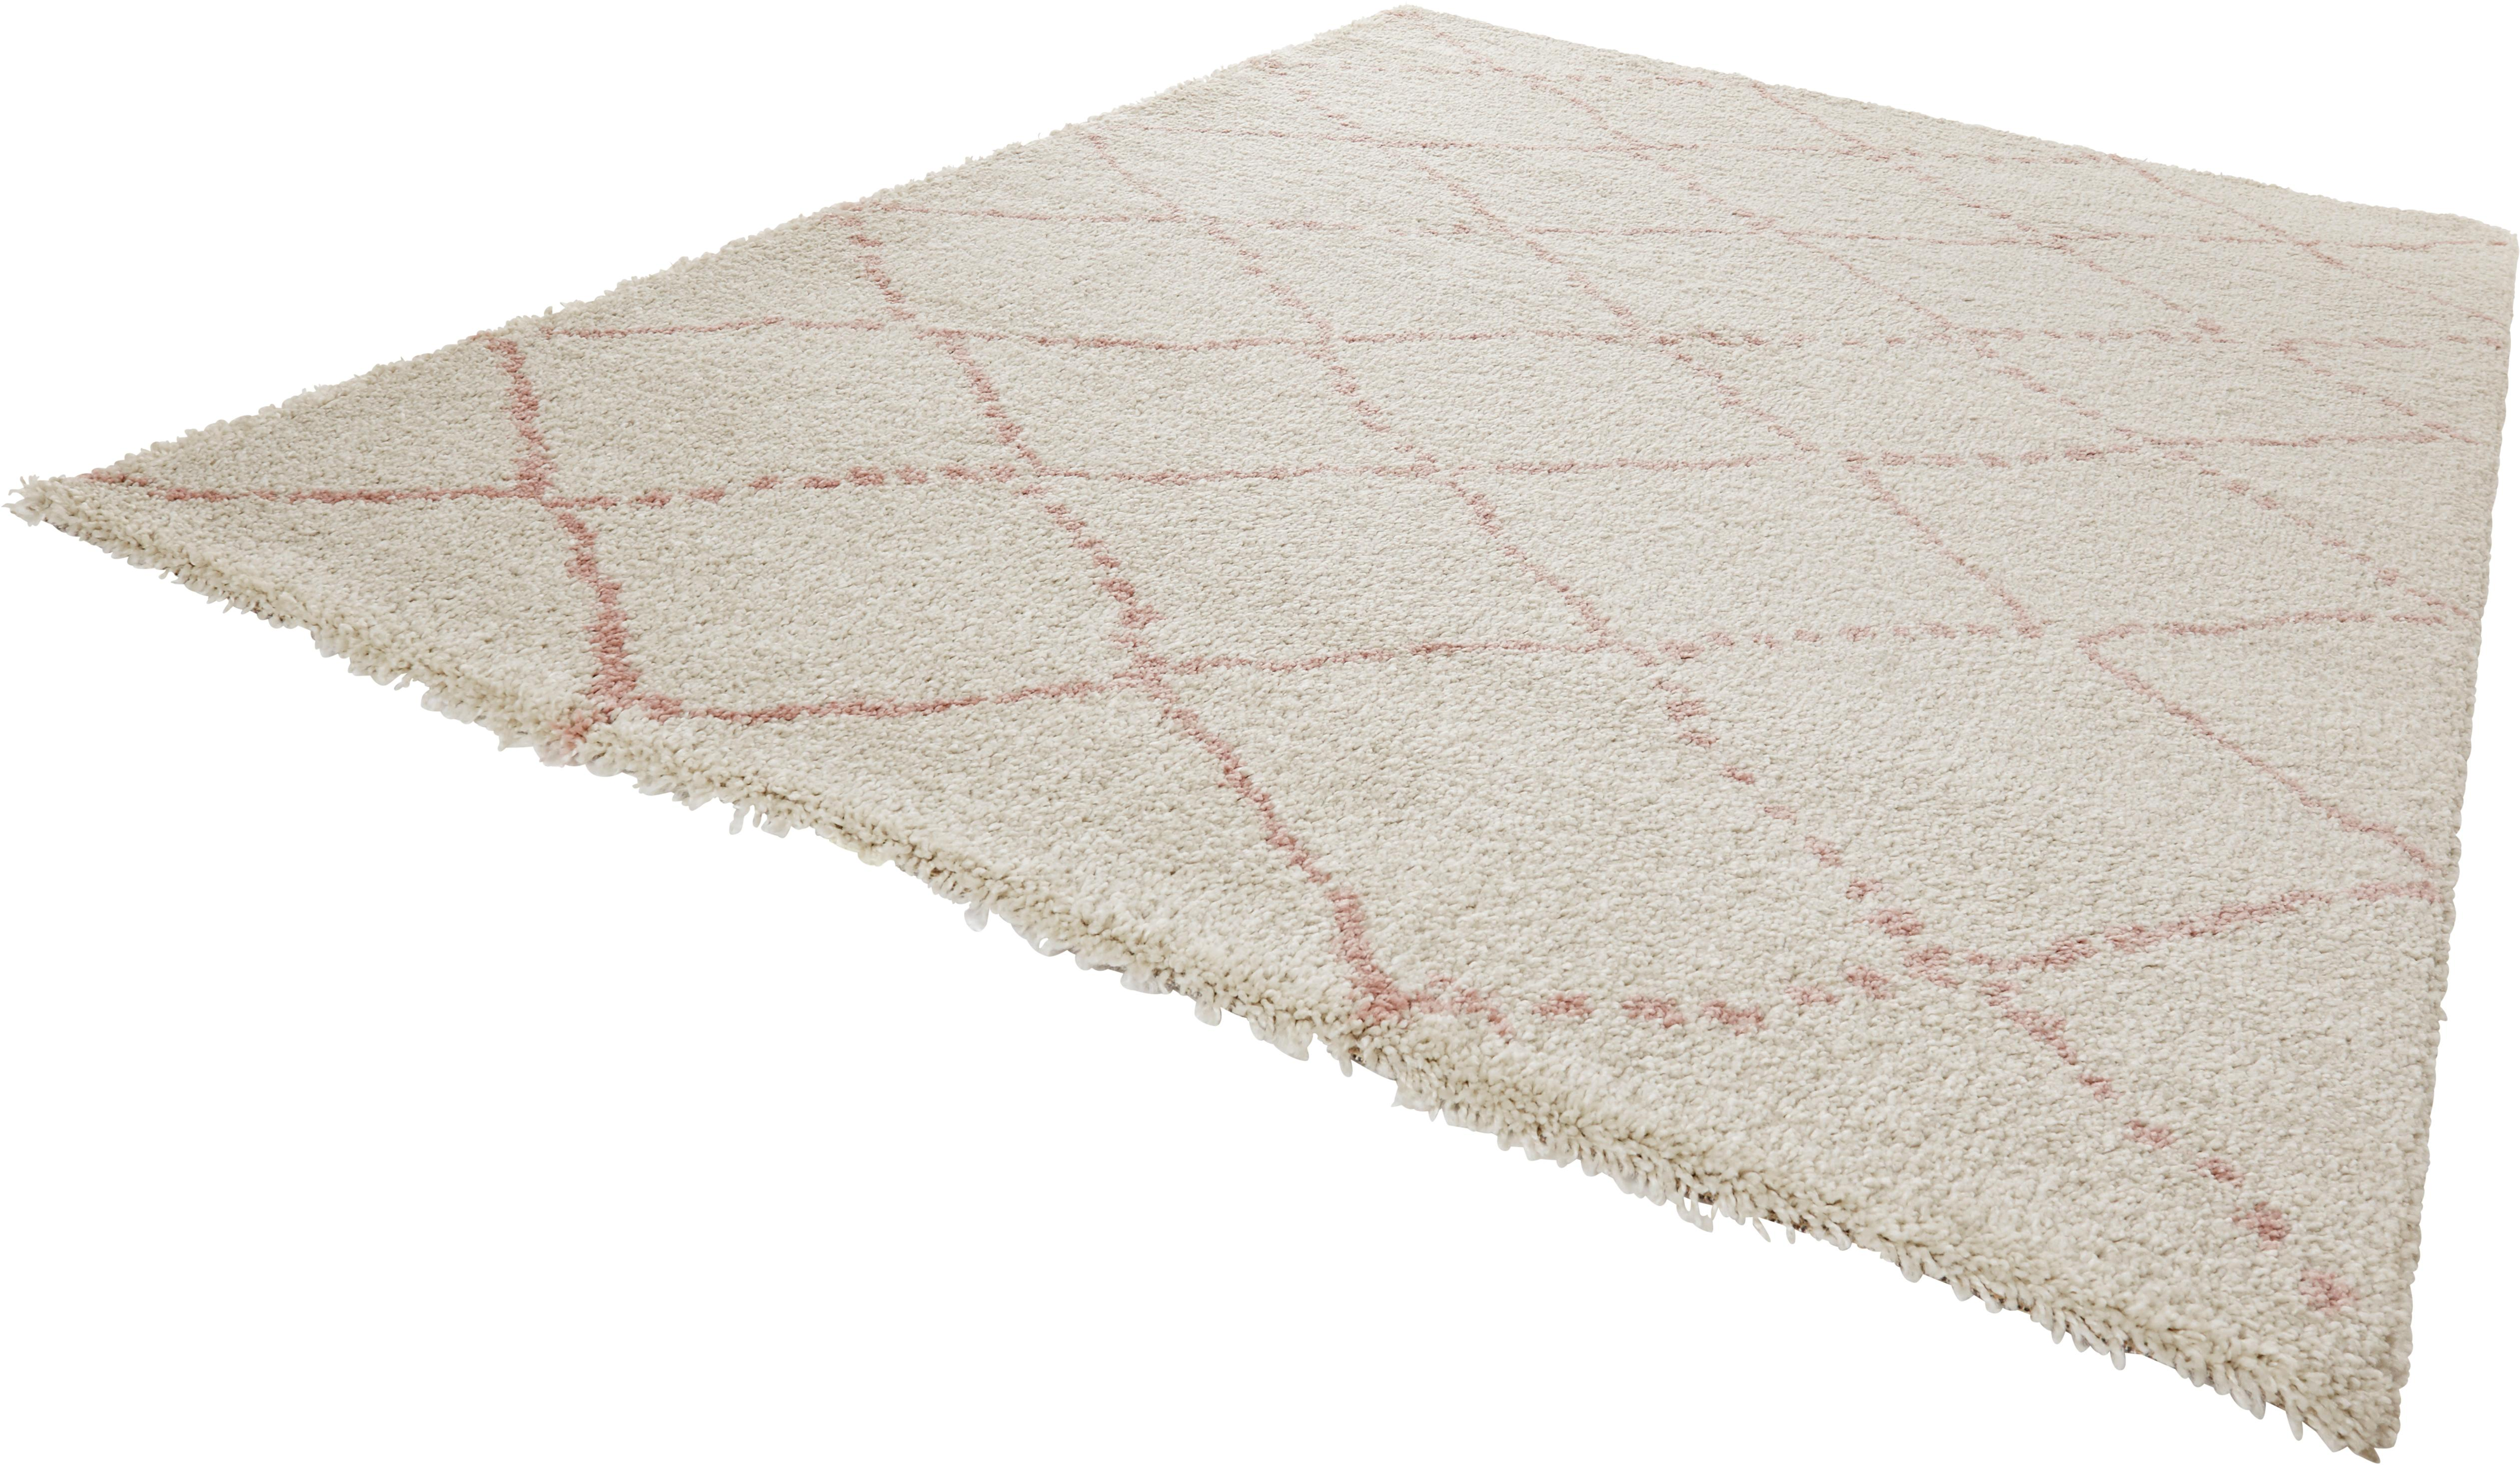 Flauschiger Hochflor-Teppich Hash in Rosa/Creme, Flor: 100% Polypropylen, Cremefarben, Rosa, B 80 x L 150 cm (Größe XS)